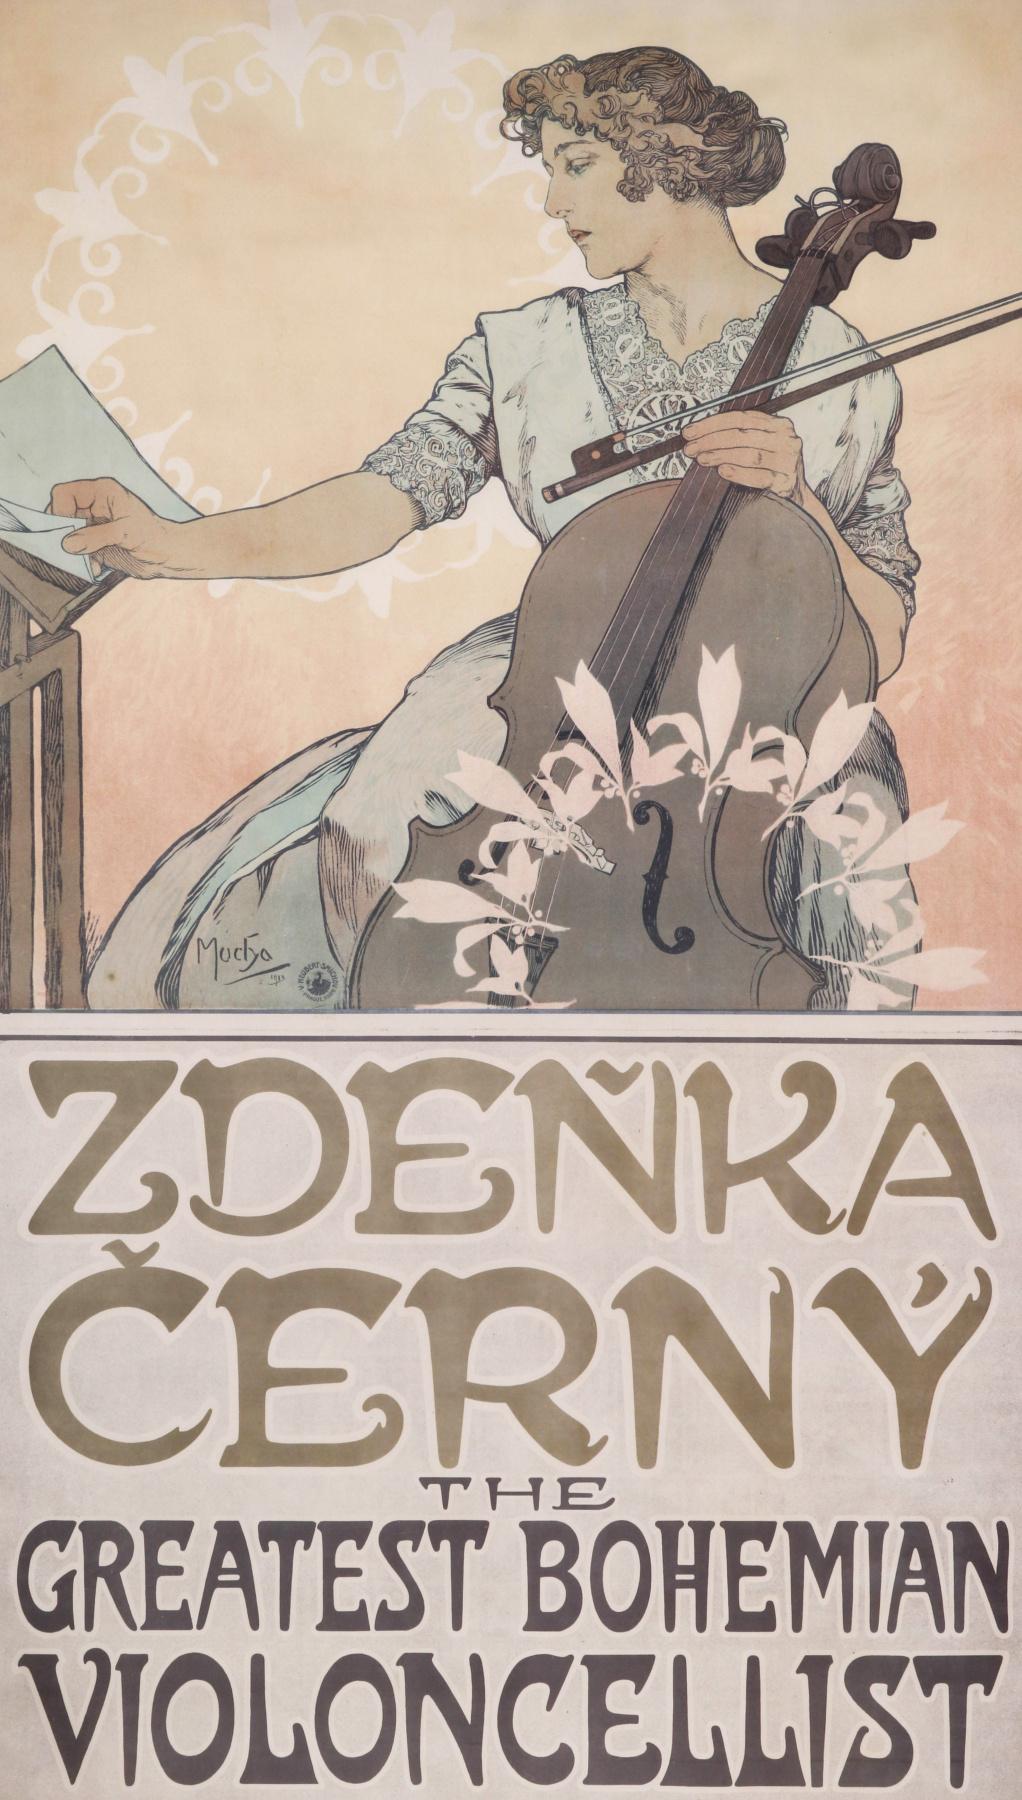 Alphonse Mucha. Poster of cellist Zdenka Cerny